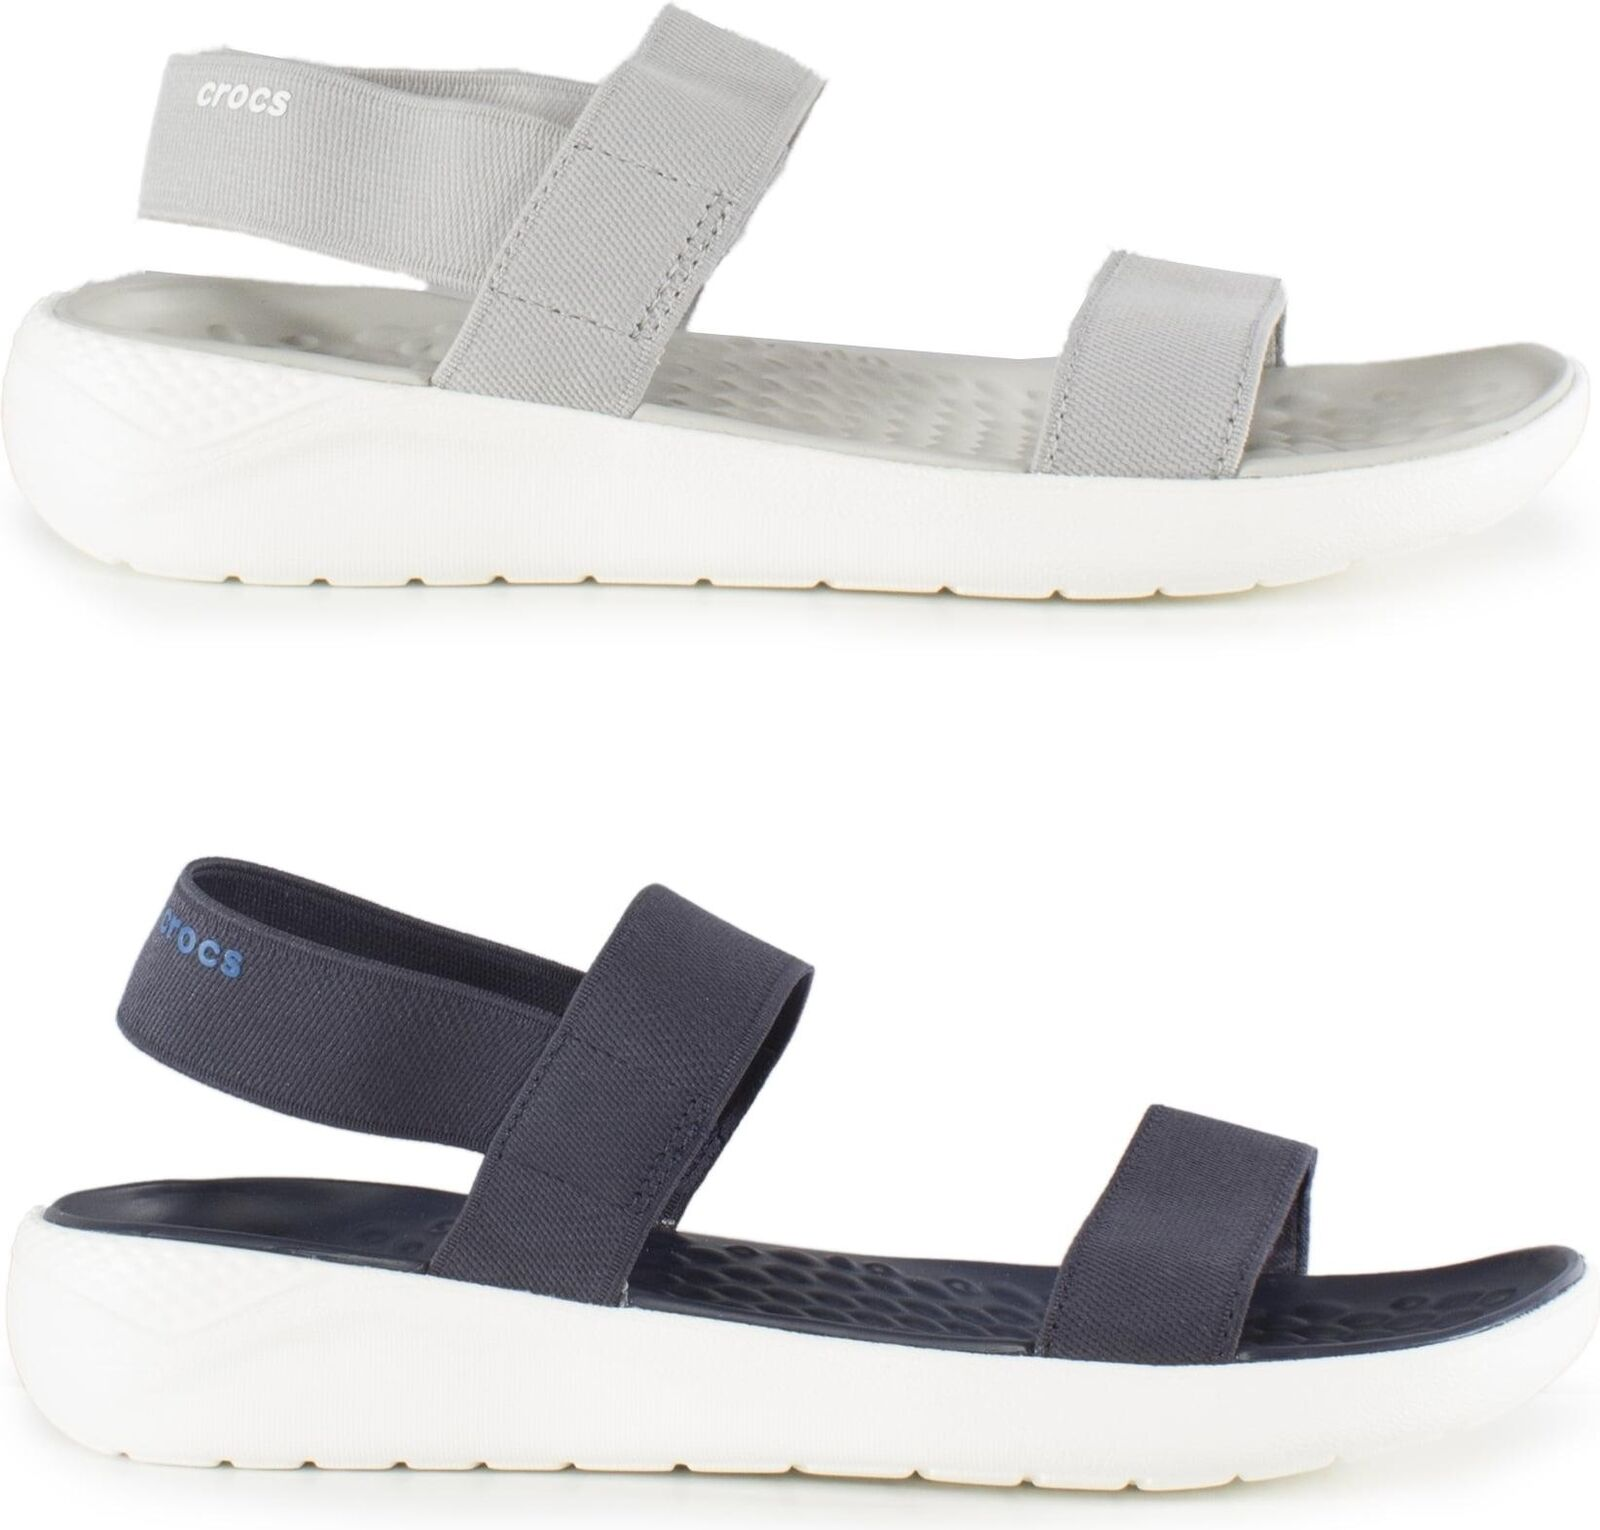 Crocs 205106 LITERIDE SANDAL Ladies Womens Beach Pool Flexible Sports Sandals